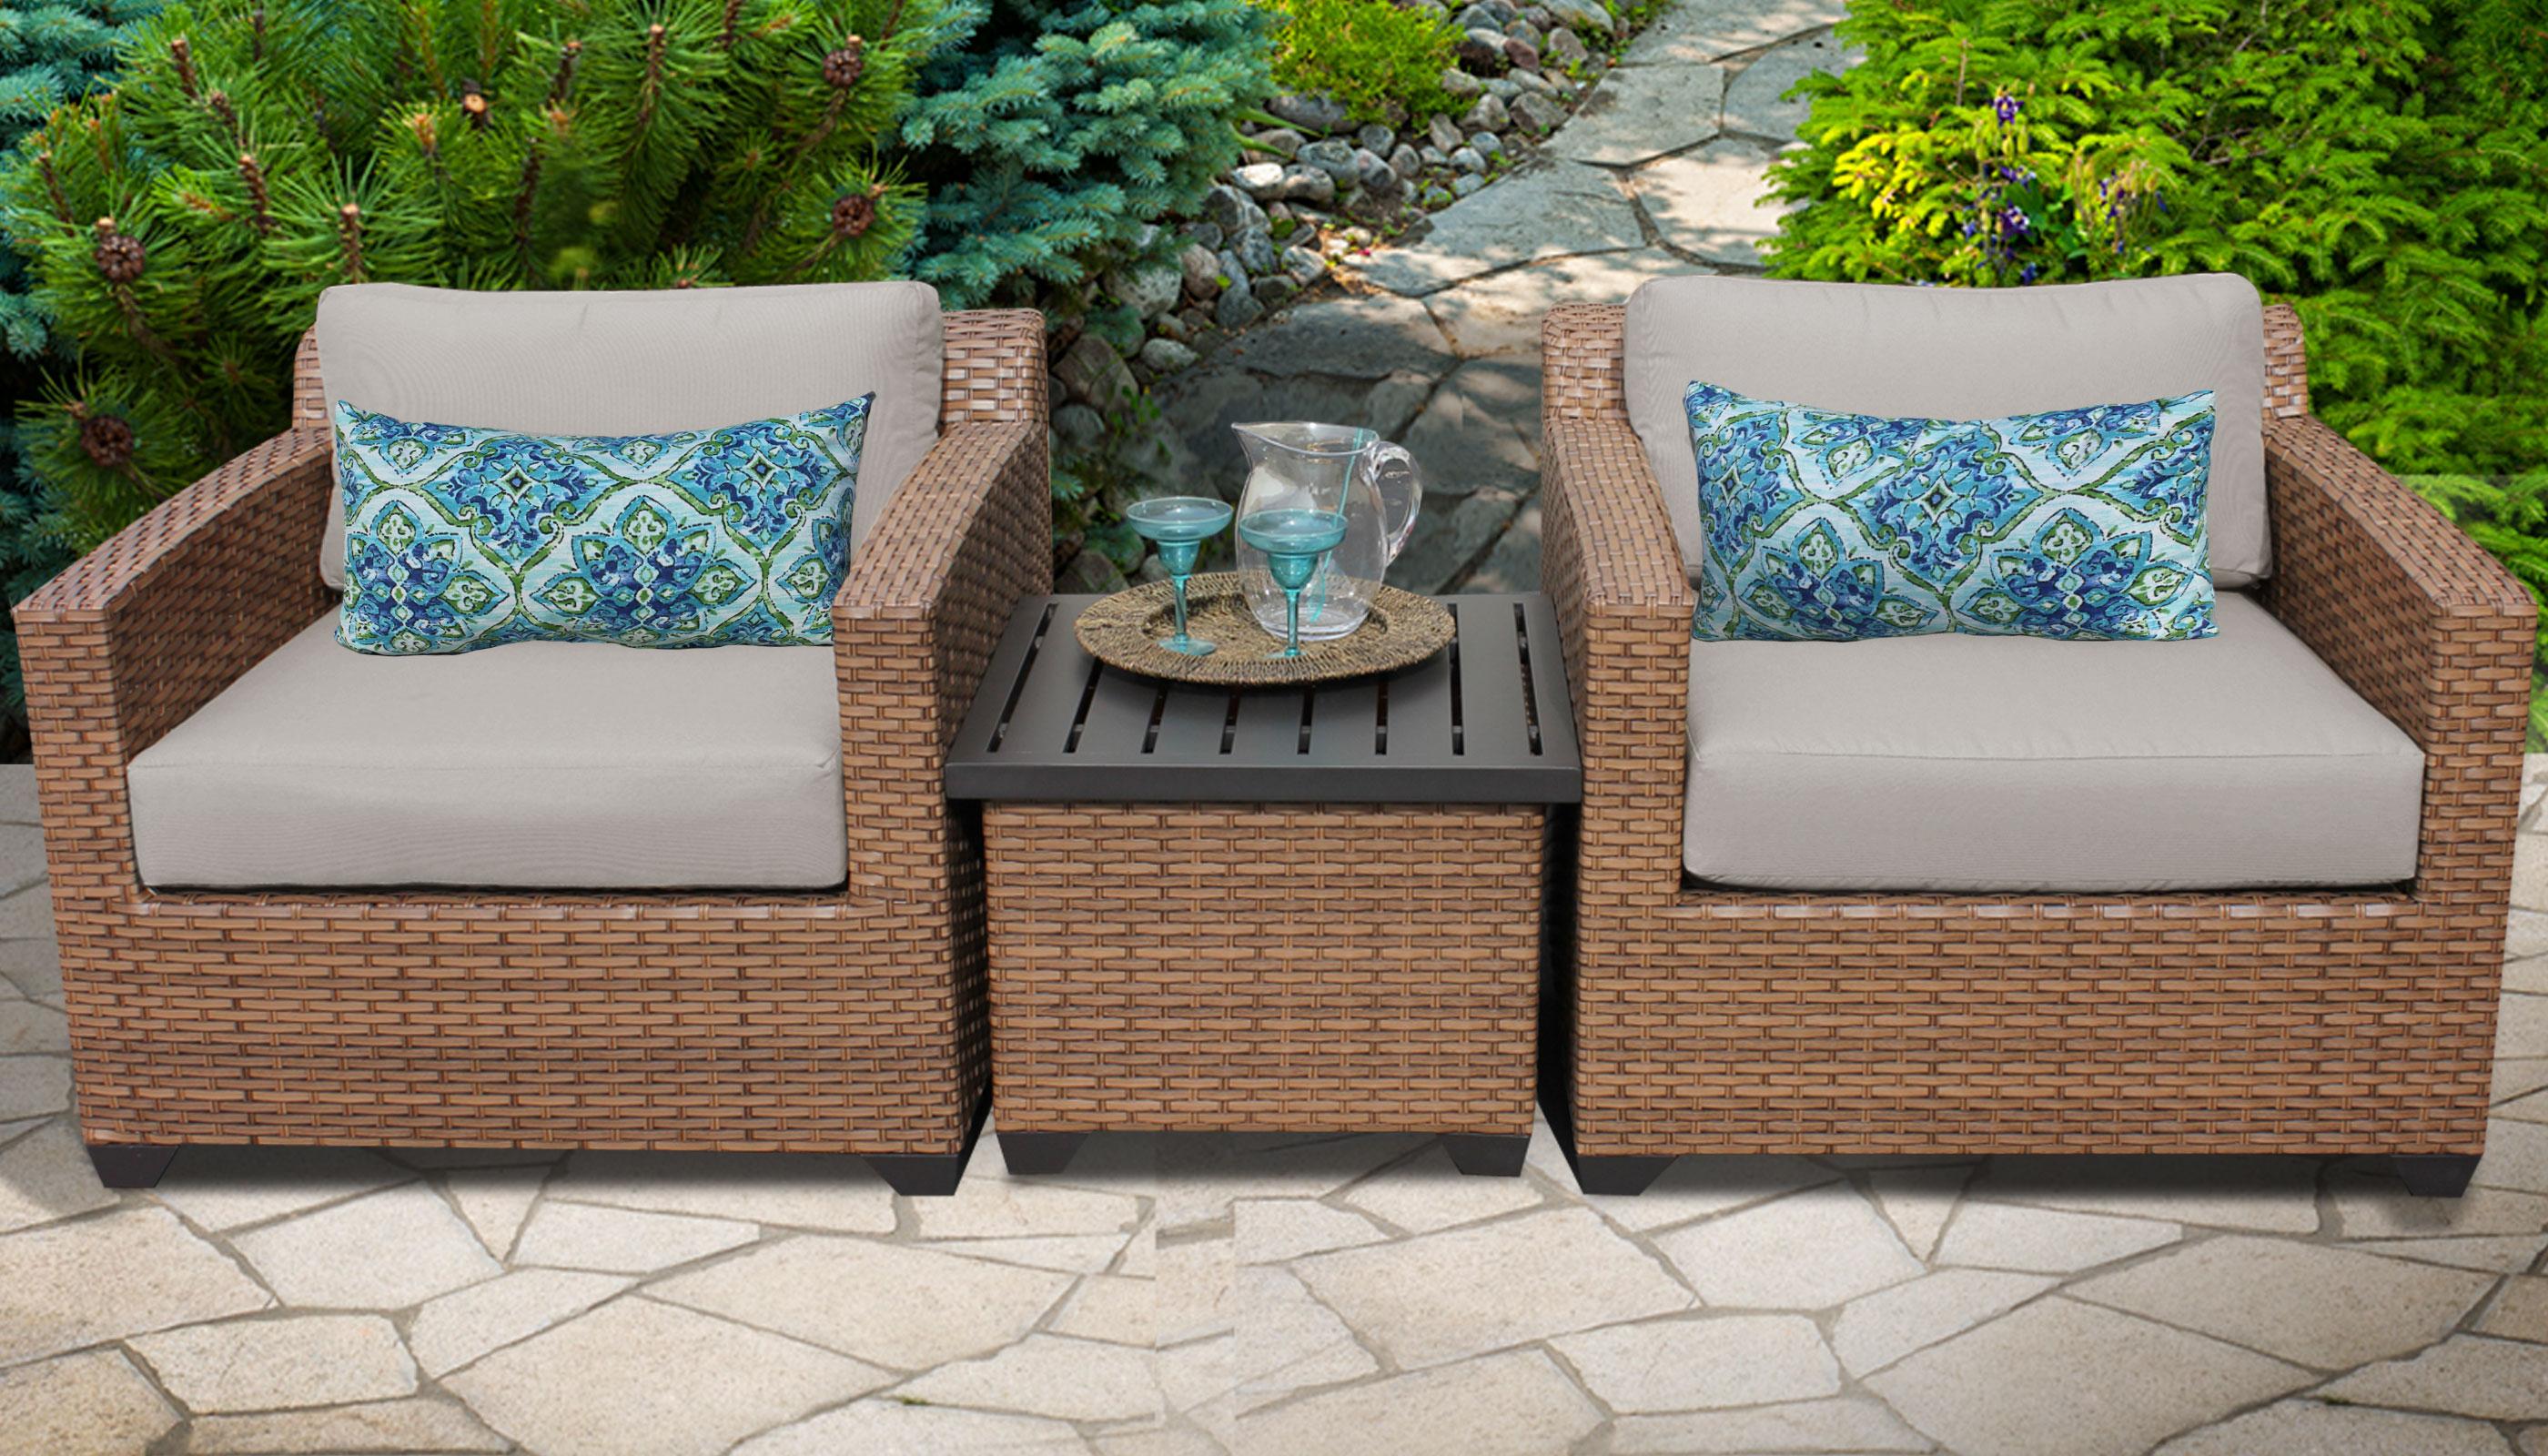 Recent Laguna Outdoor Sofas With Cushions Regarding Laguna 3 Piece Outdoor Wicker Patio Furniture Set 03A (View 16 of 20)